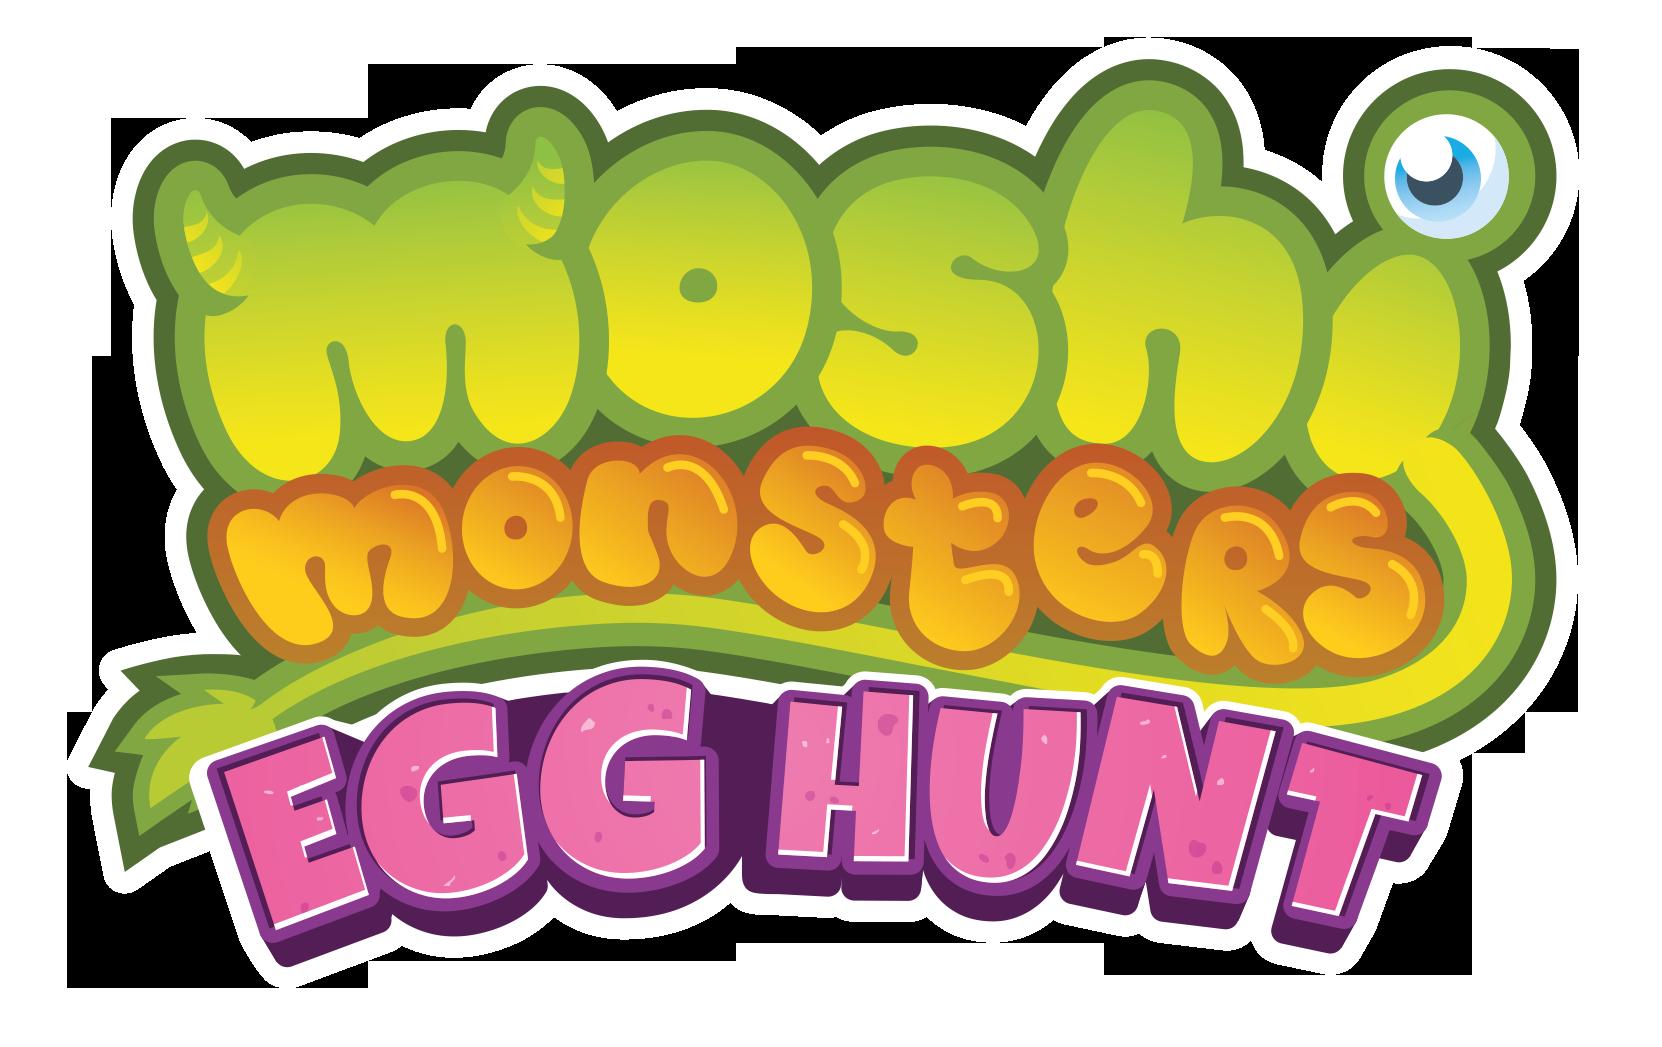 Secret clipart secret code. Moshi monsters egg hunt